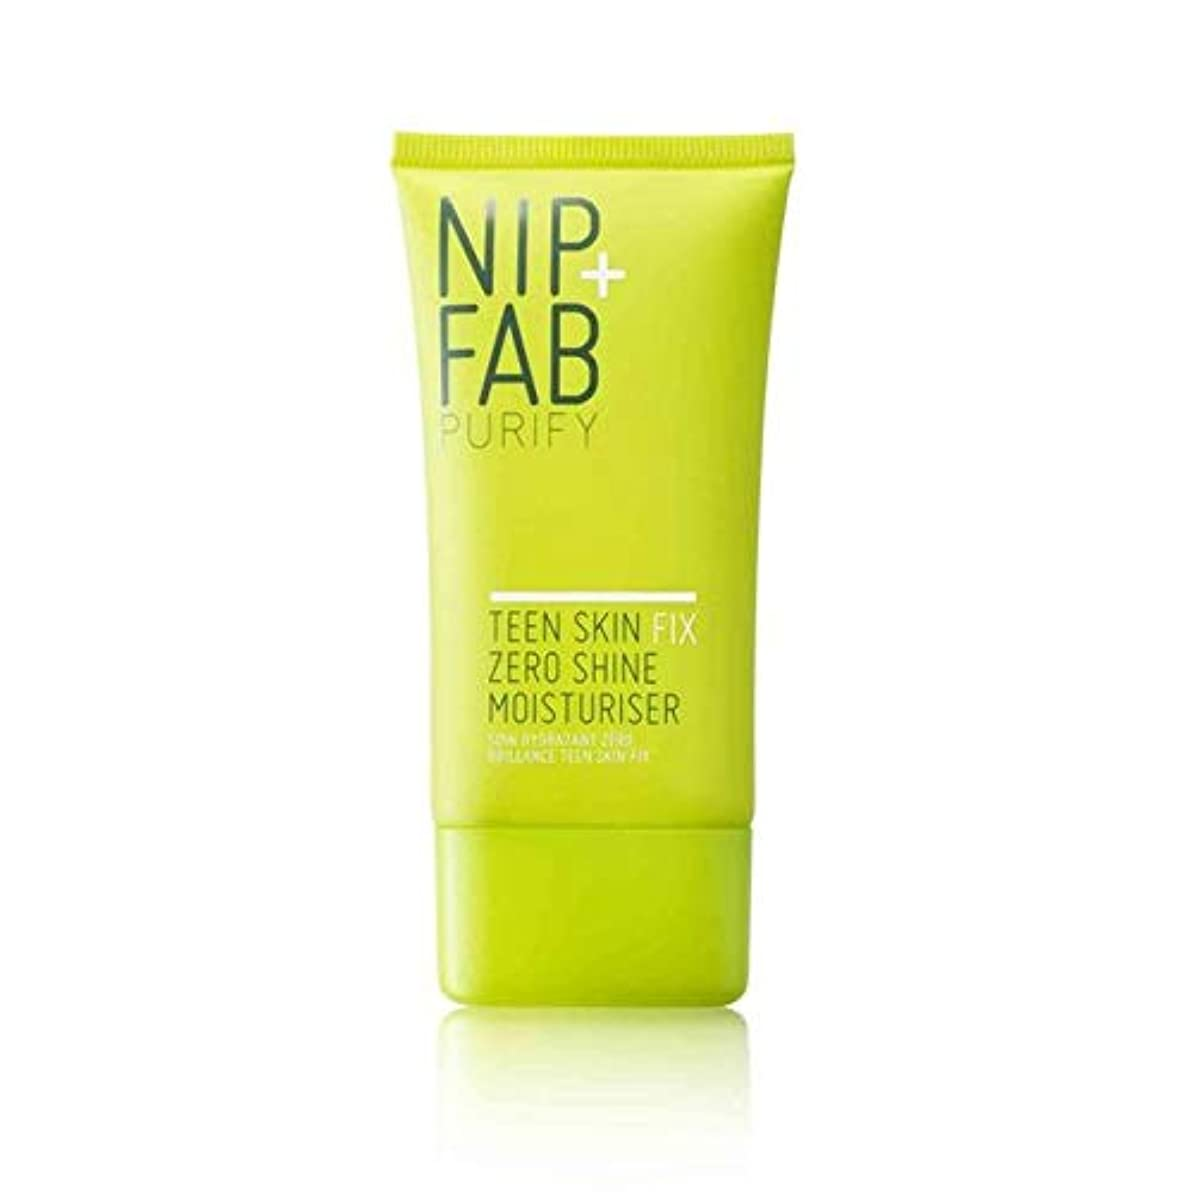 [Nip & Fab ] + Fab十代の肌ニップゼロ輝き保湿40ミリリットルを修正 - Nip+Fab Teen Skin Fix Zero Shine Moisturiser 40ml [並行輸入品]